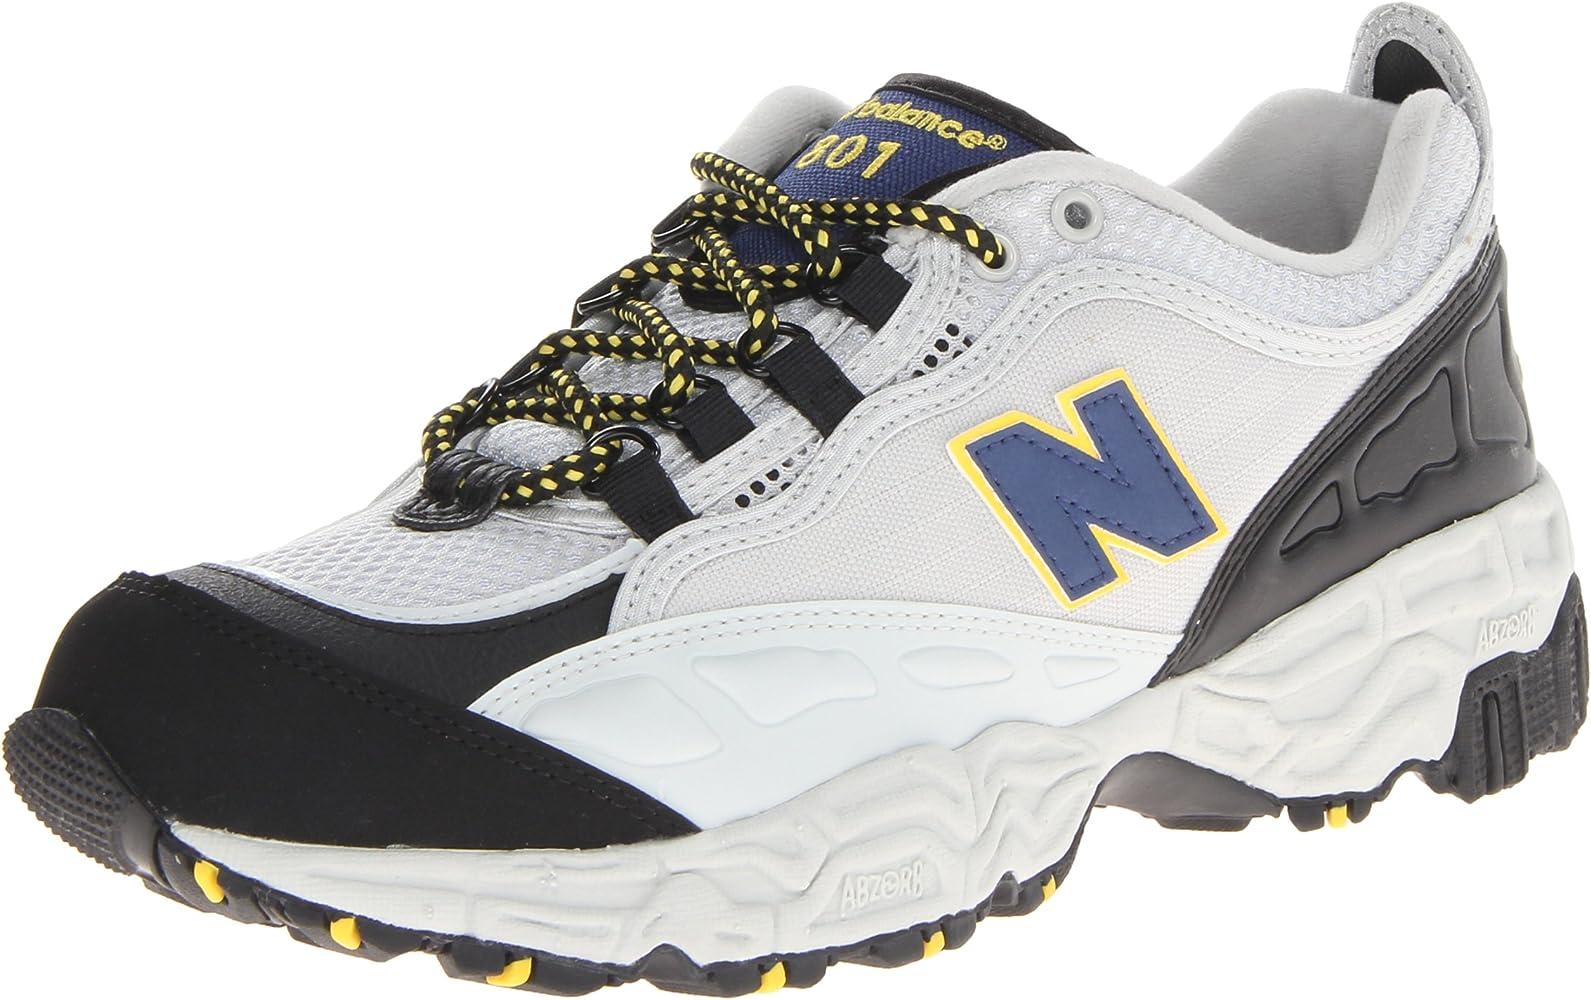 New Balance Men's M801 Classic Trail Running Shoe